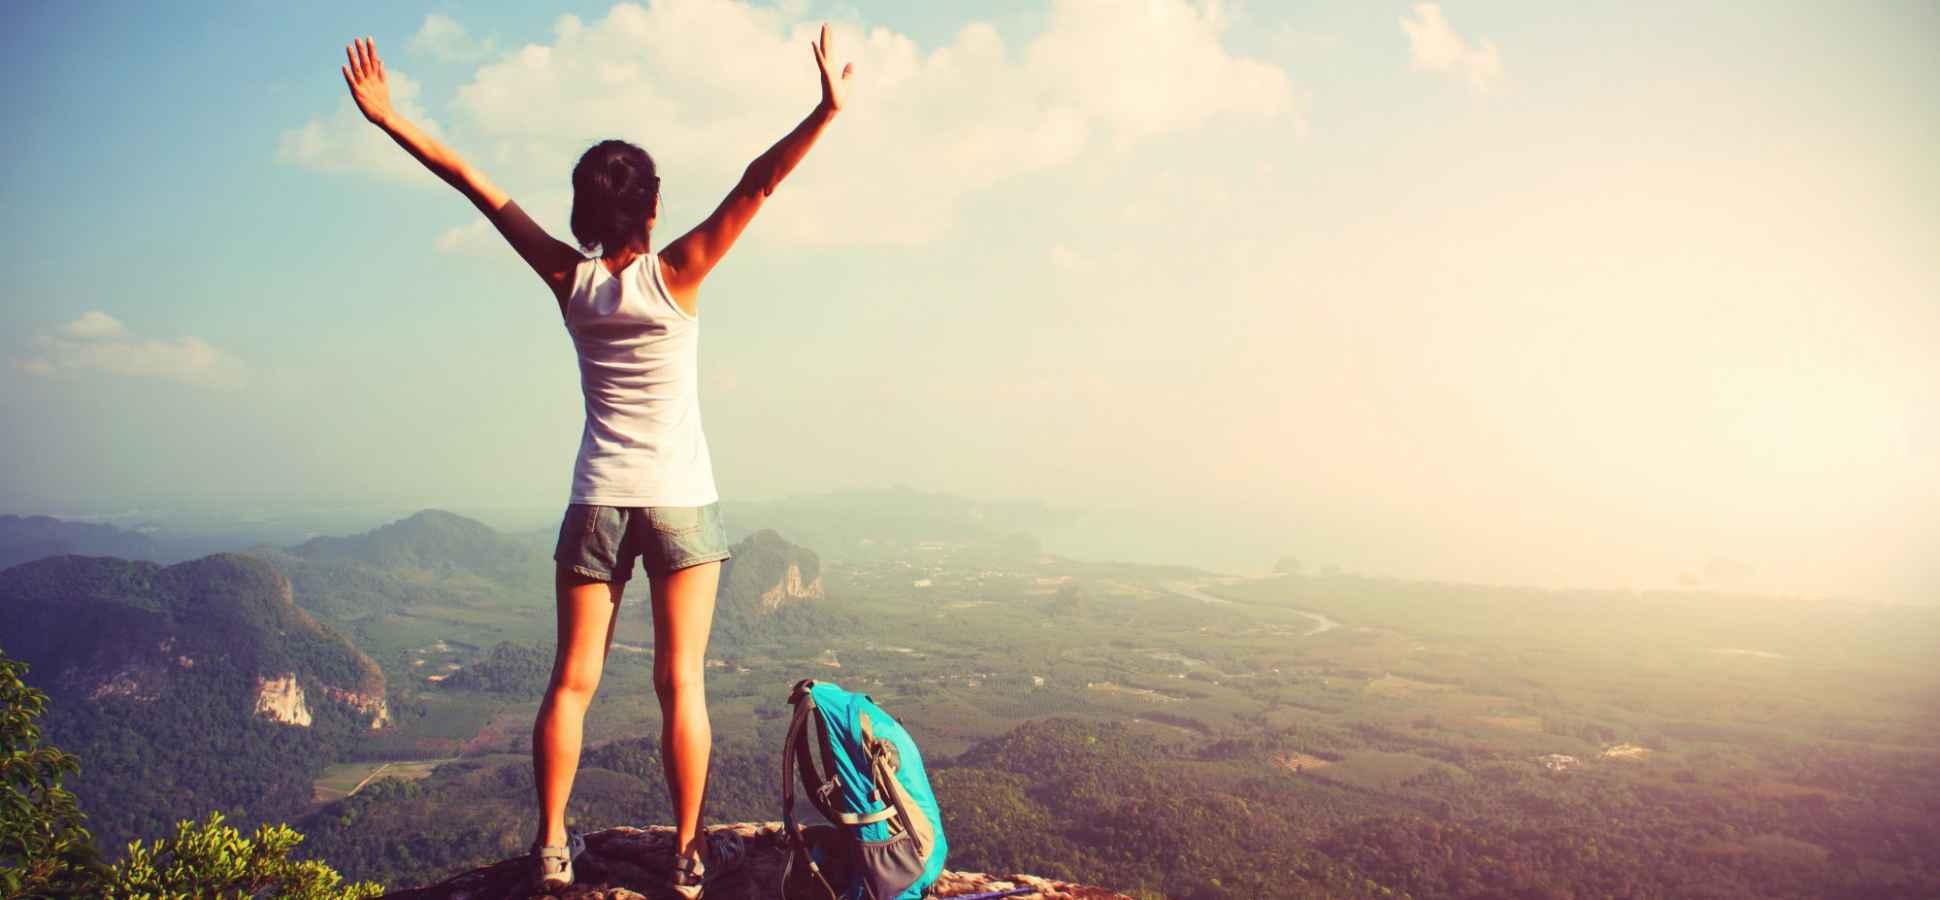 Goodbye, Corporate America: 4 Benefits of Entrepreneurship